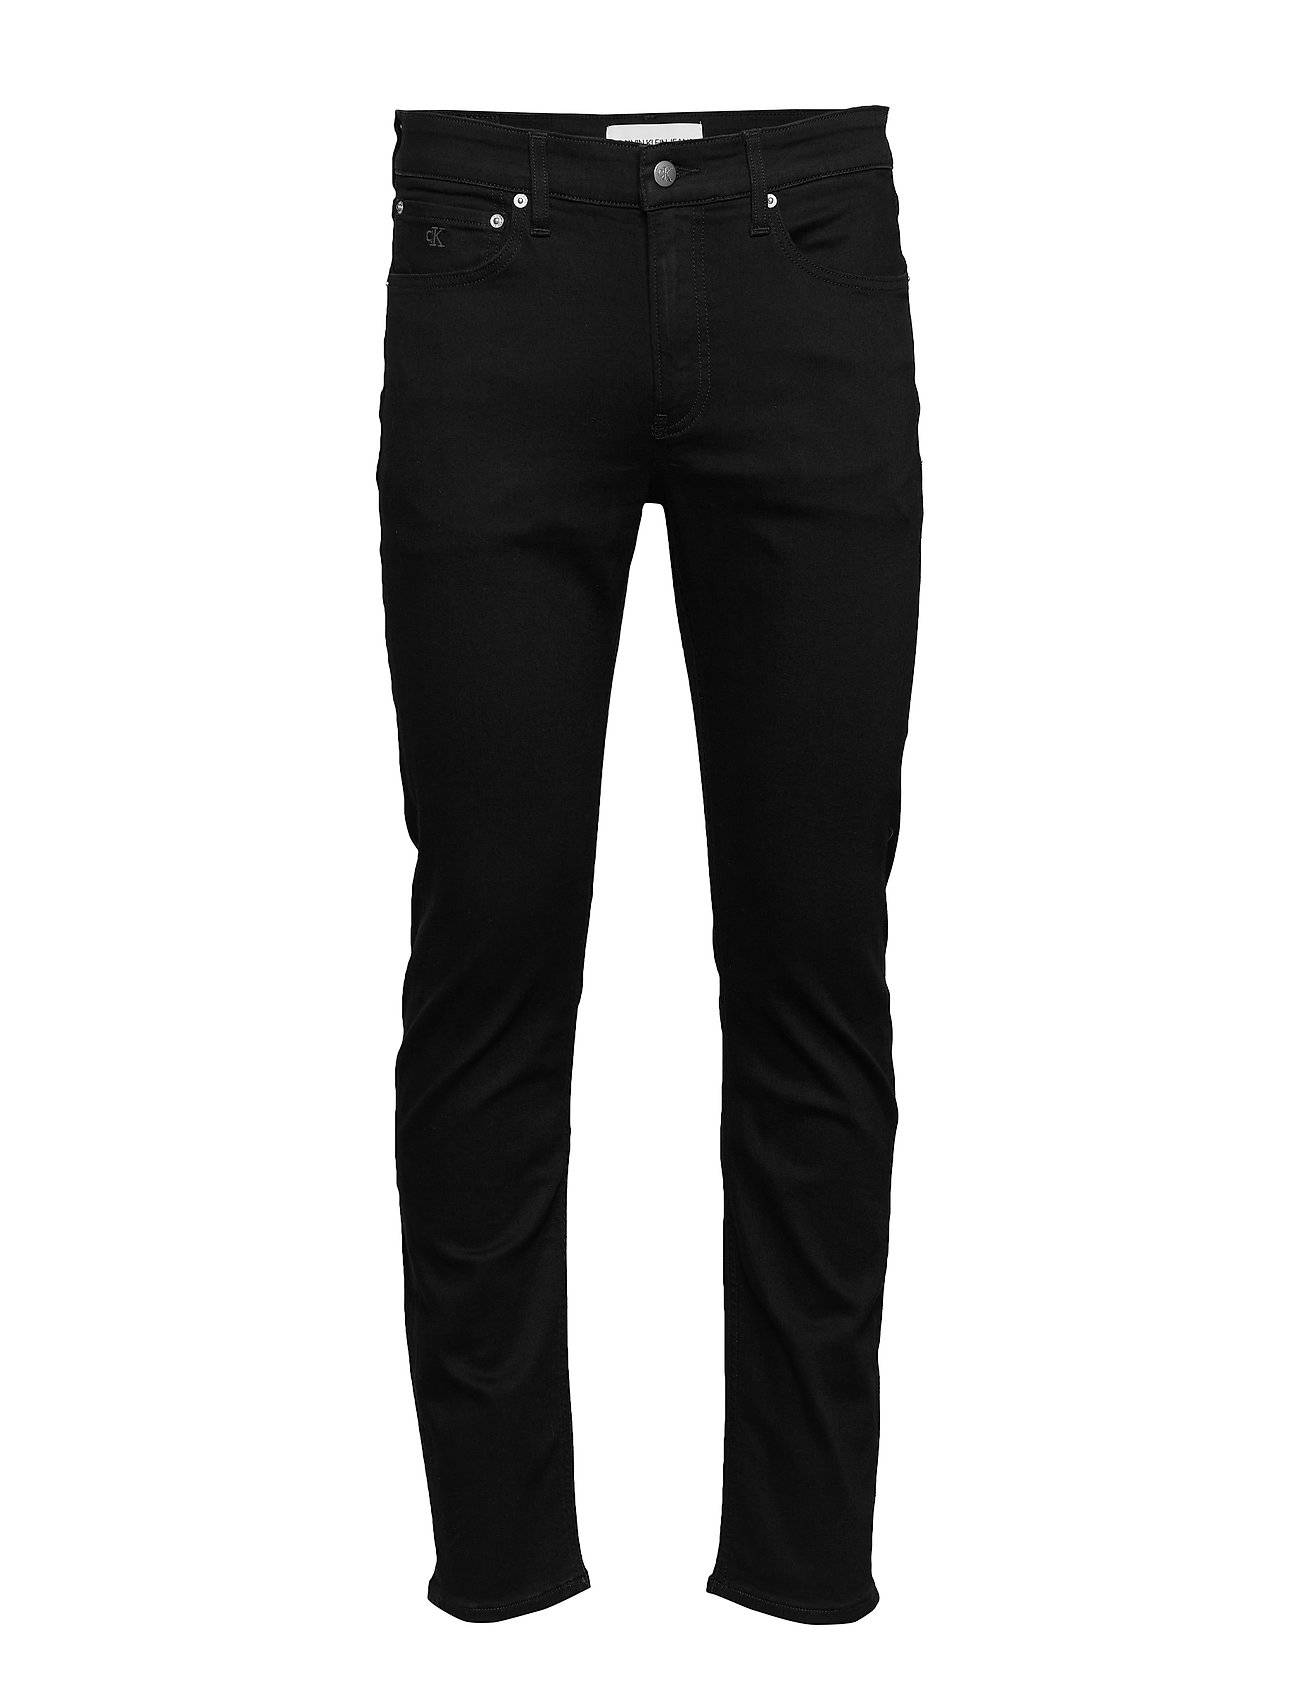 Image of Calvin Ckj 058 Slim Taper Tiukat Farkut Musta Calvin Klein Jeans